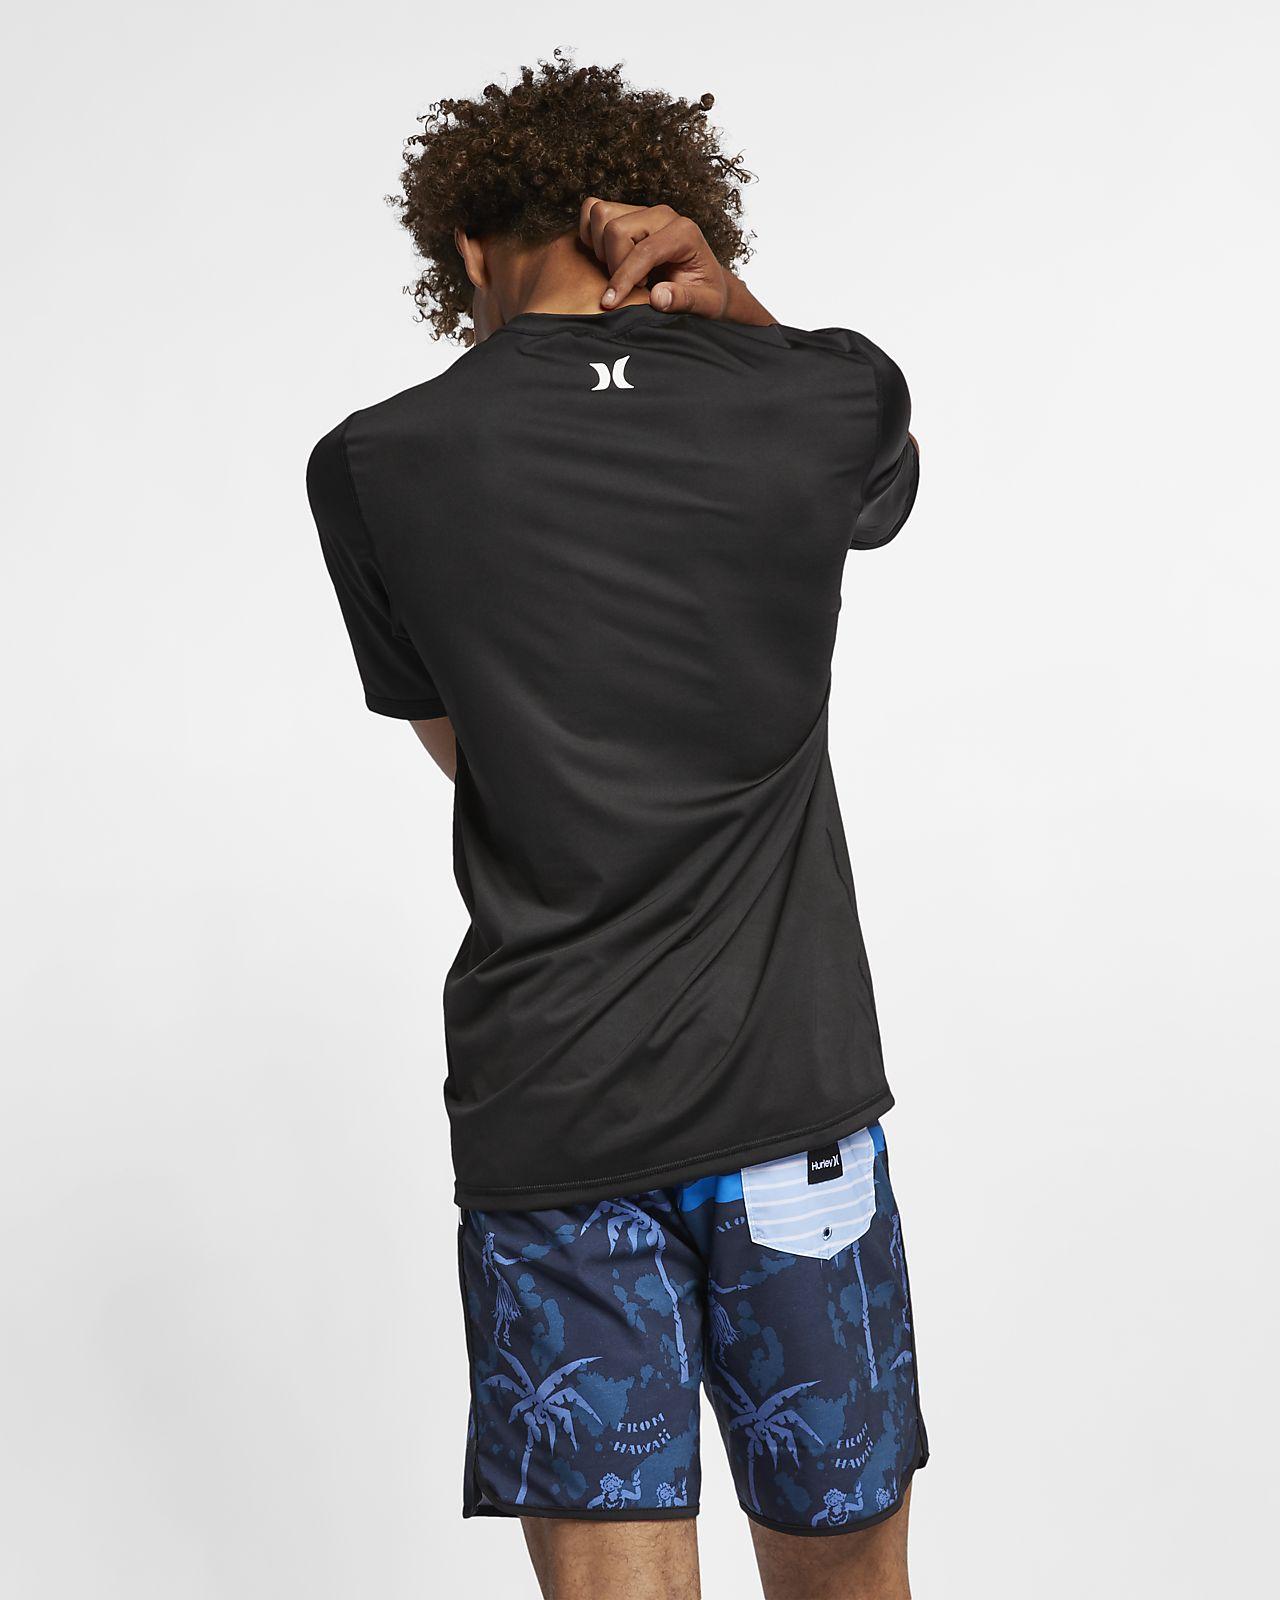 d191c026ba Camiseta de surf manga corta para hombre Hurley One And Only. Nike ...